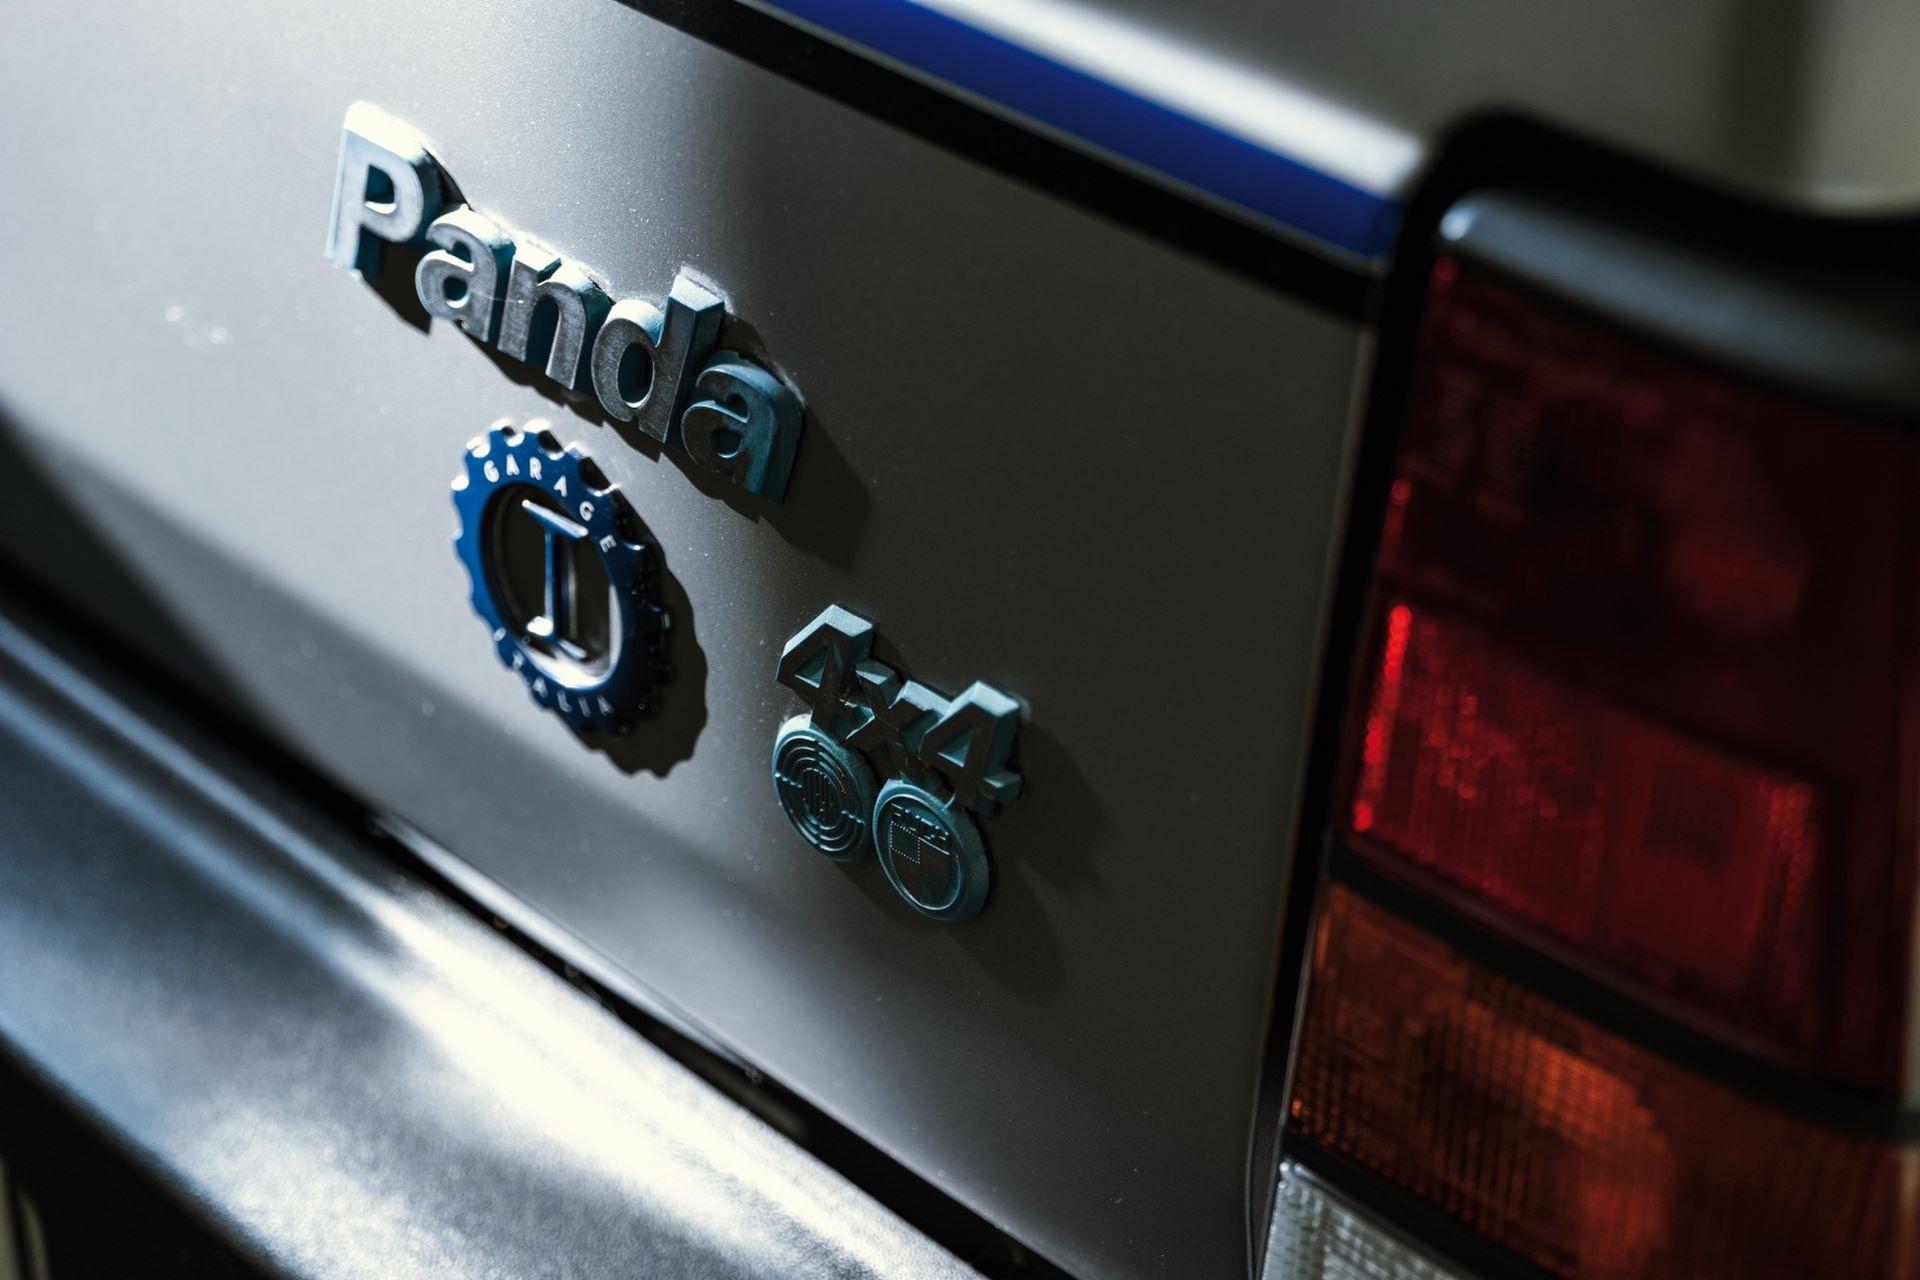 Fiat-Panda-Gianni-Agnelli-auction-15